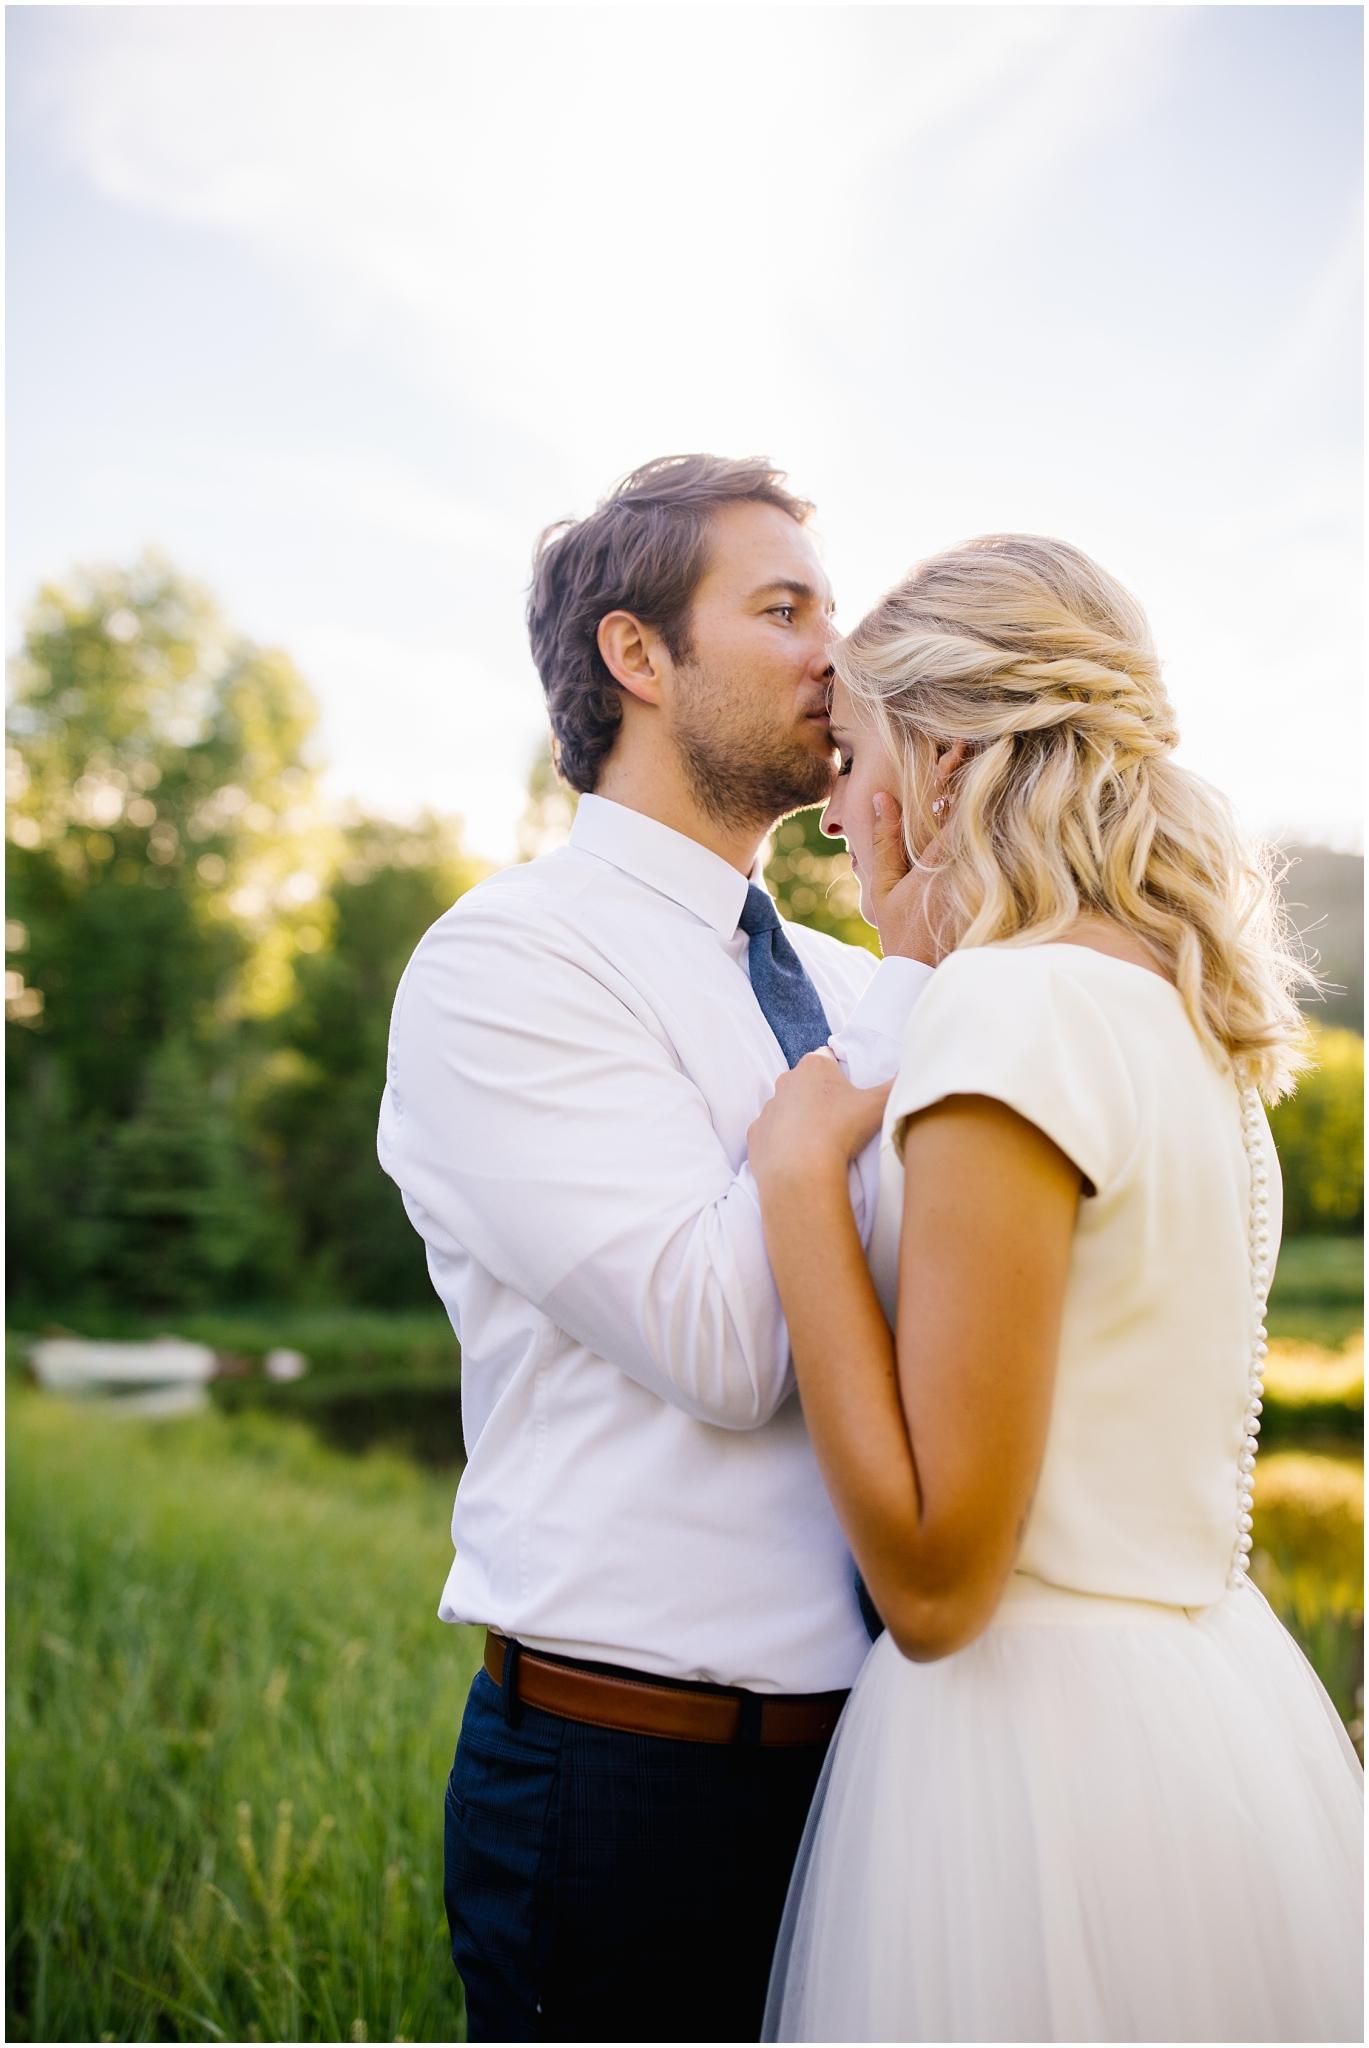 LakeShoot-46_Lizzie-B-Imagery-Utah-Wedding-Photographer-Salt-Lake-City-Park-City-Oakley.jpg